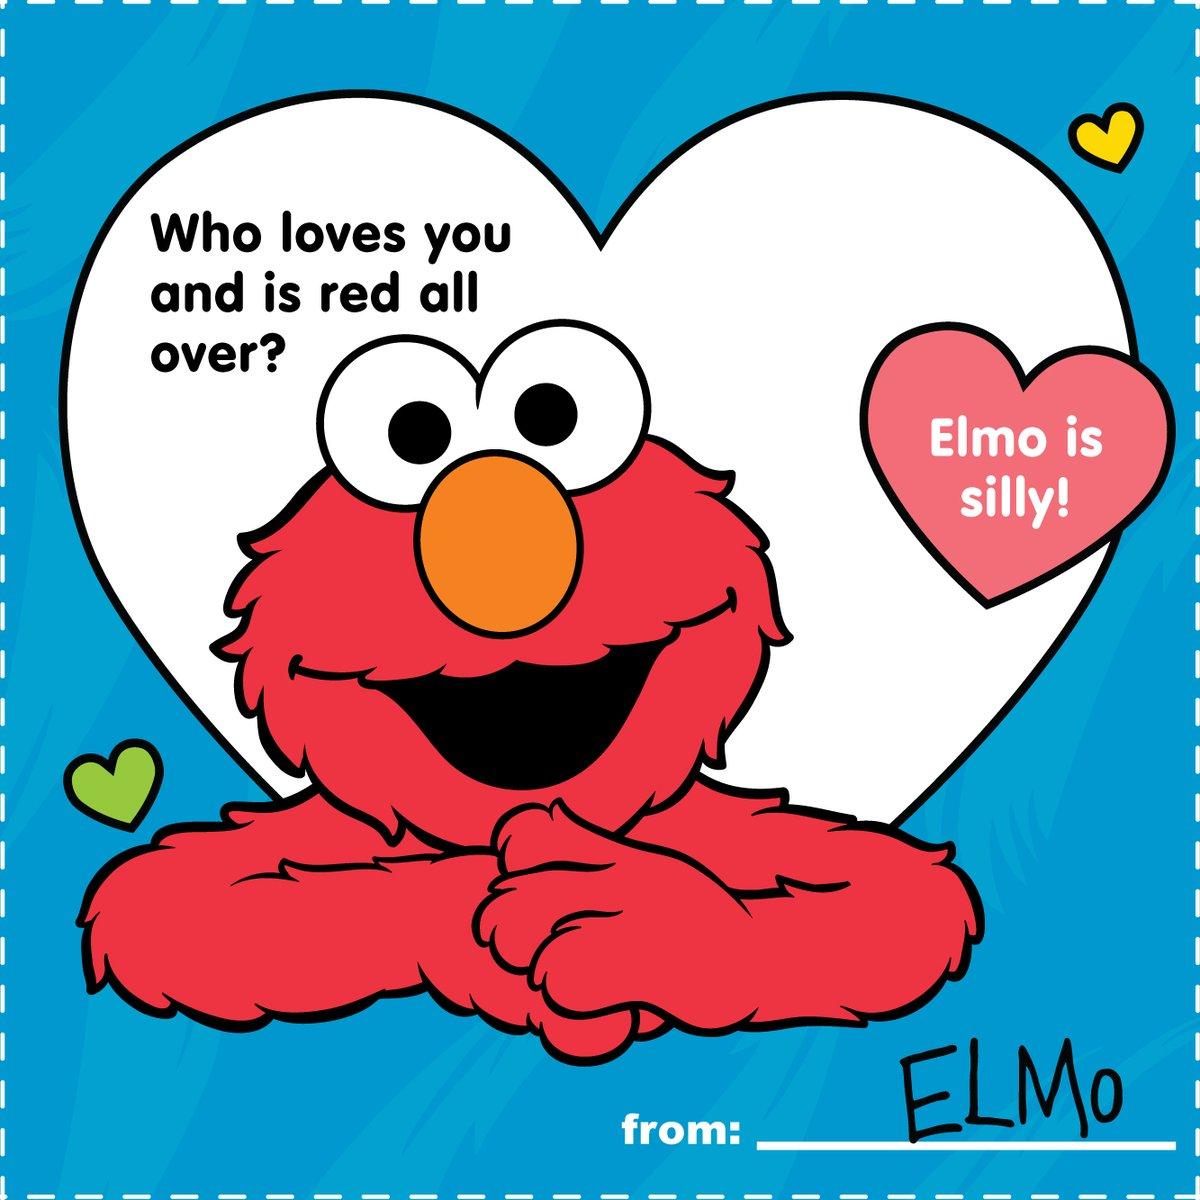 Elmo (@elmo) | Twitter